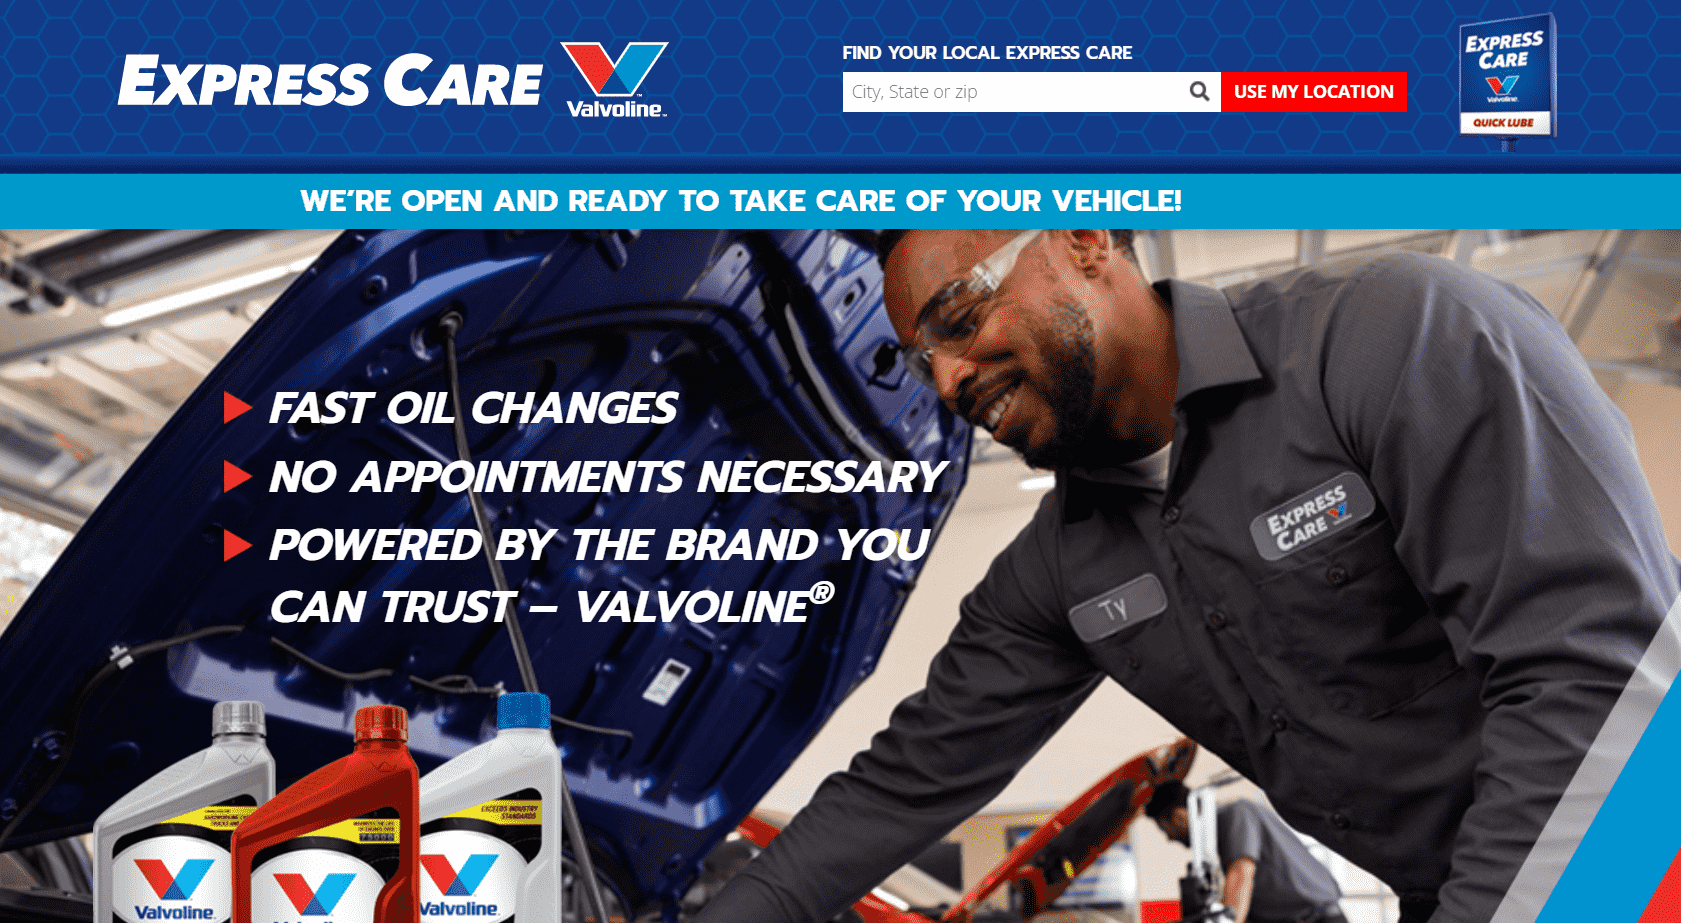 Valvoline Express Care reviews and complaints